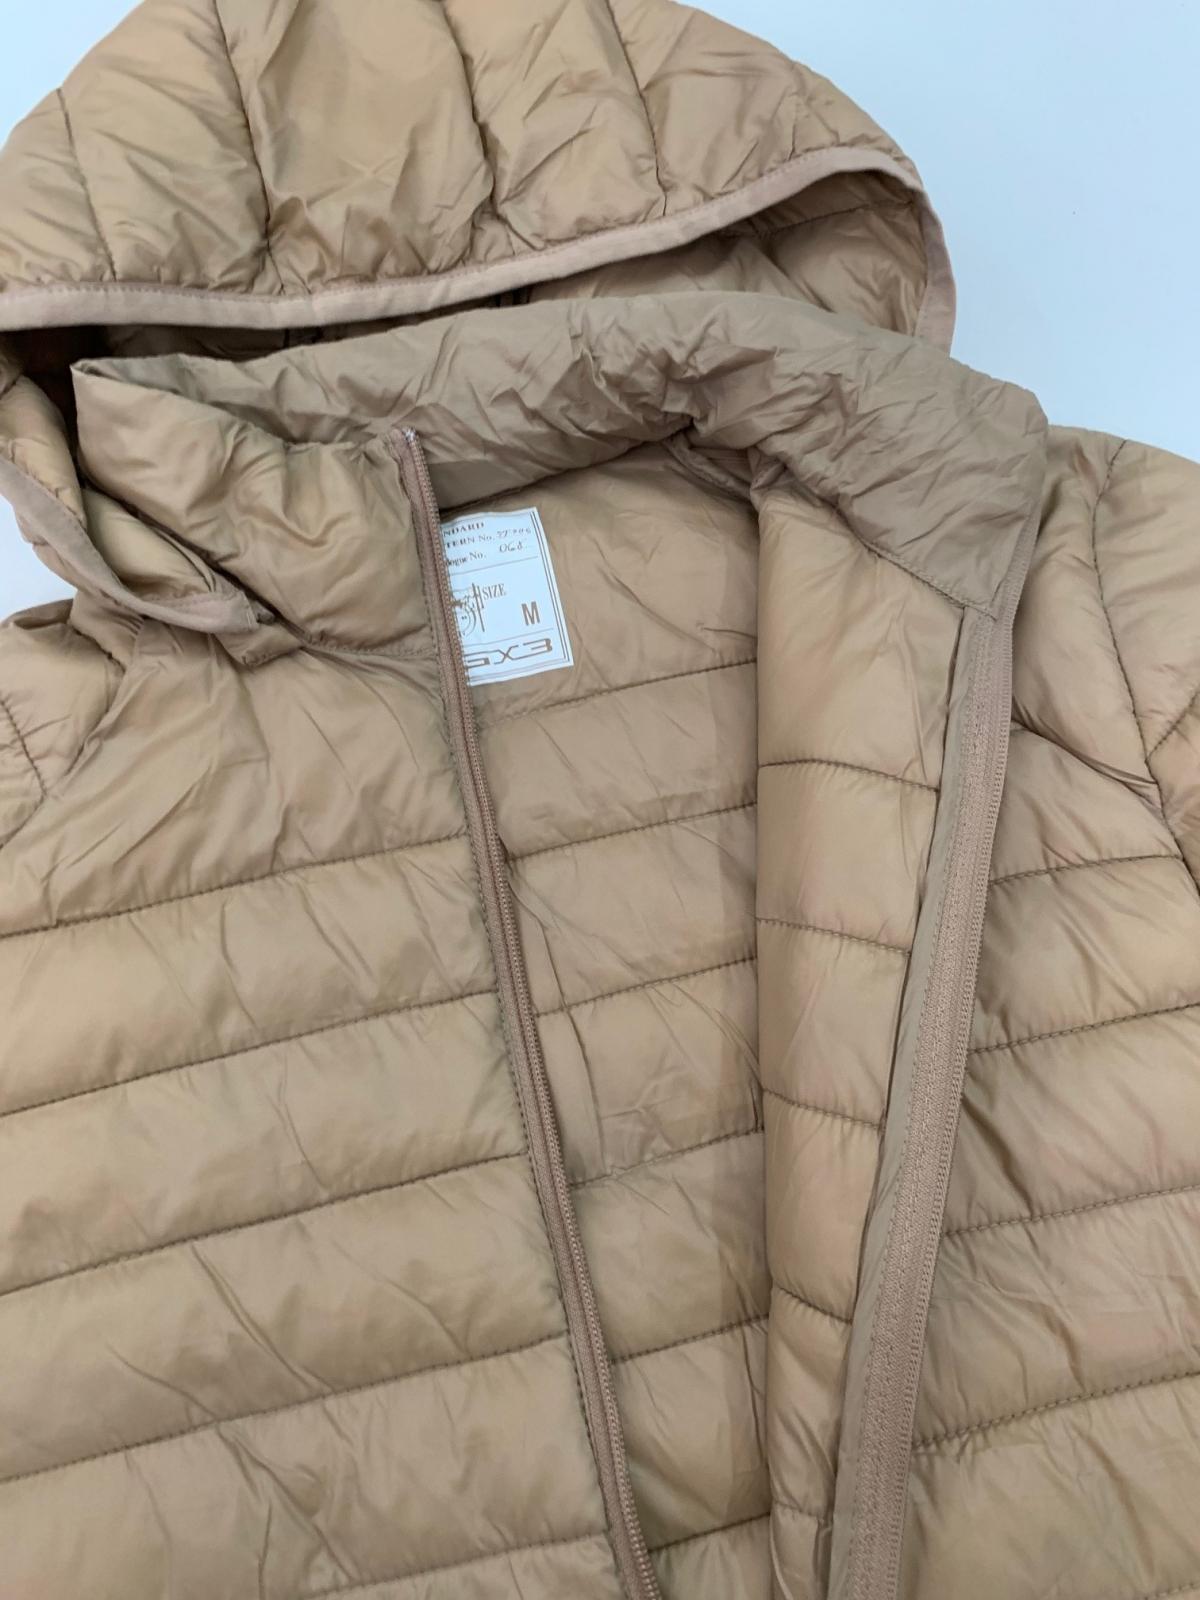 Светлая женская куртка от бренда GX3